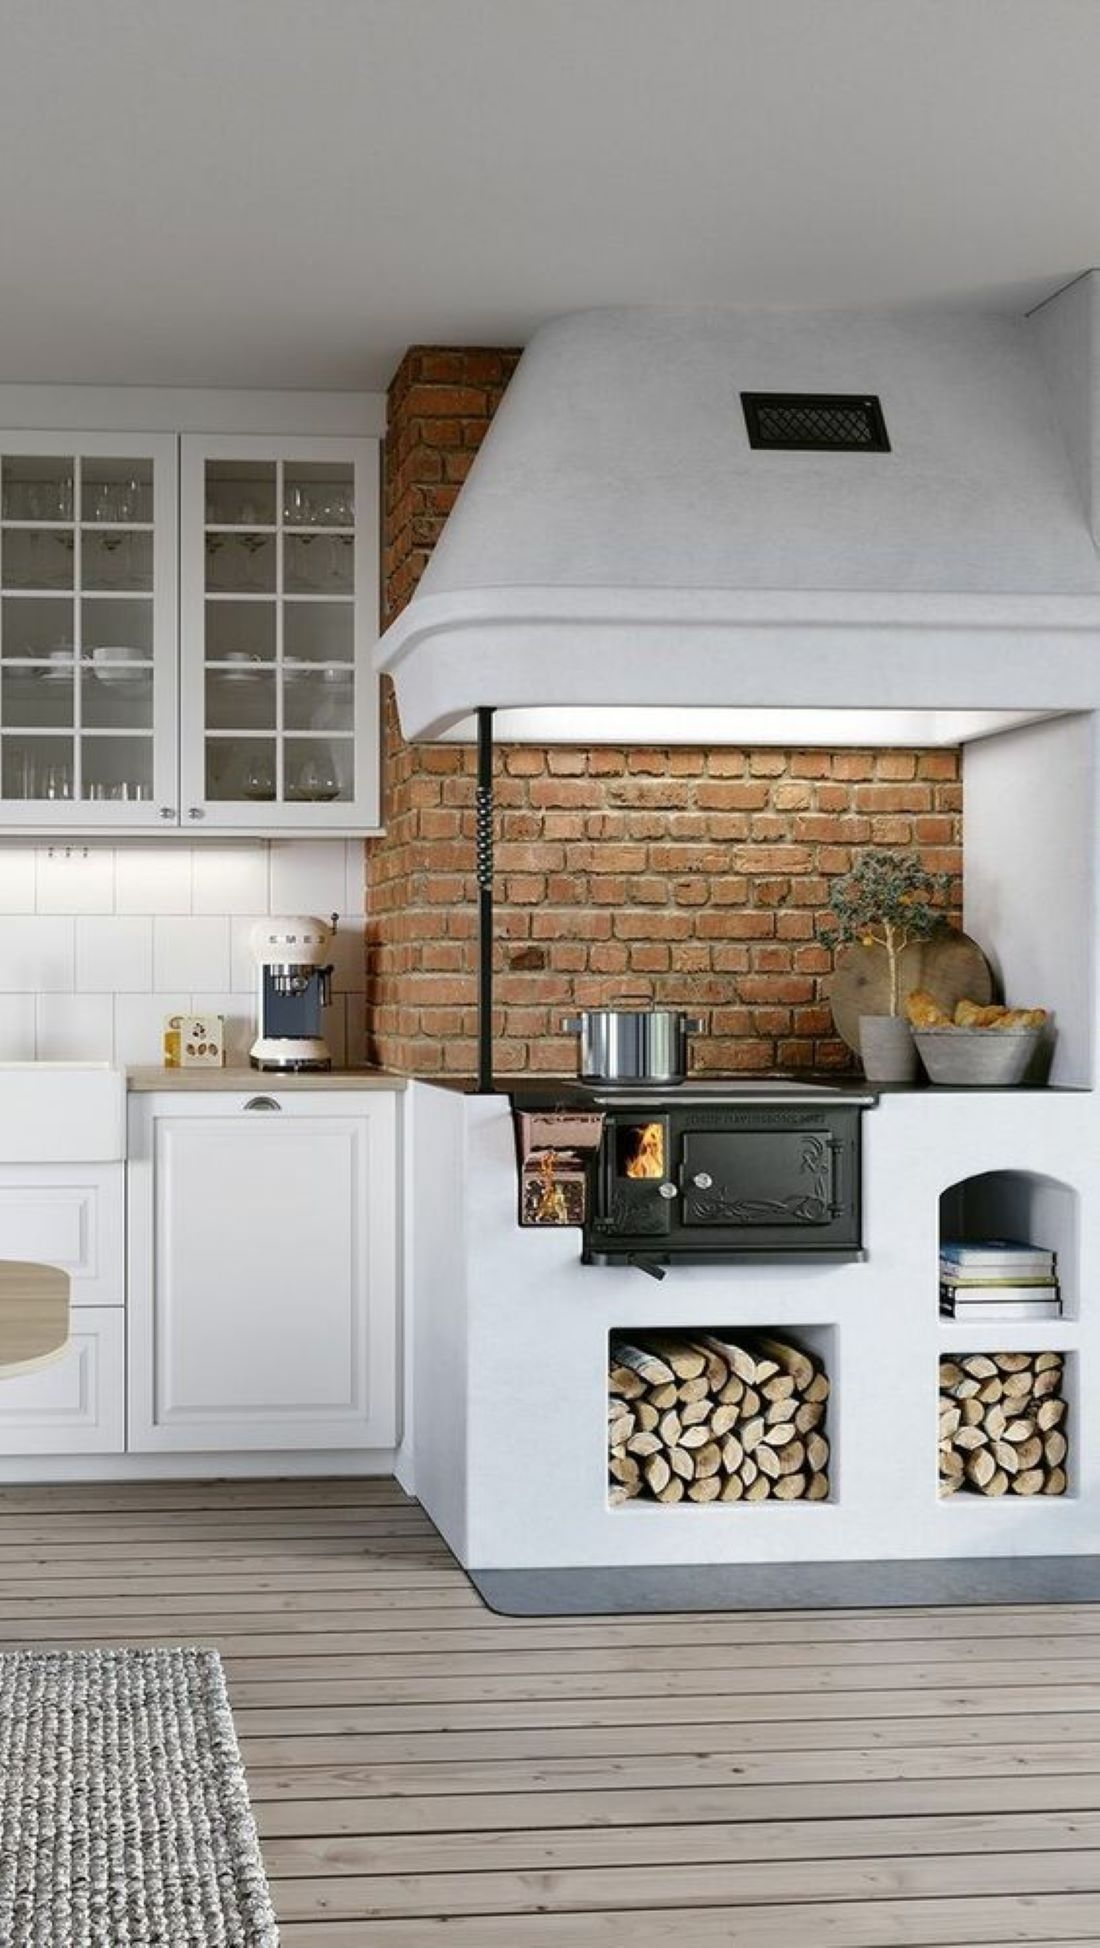 Menő design a konyhában